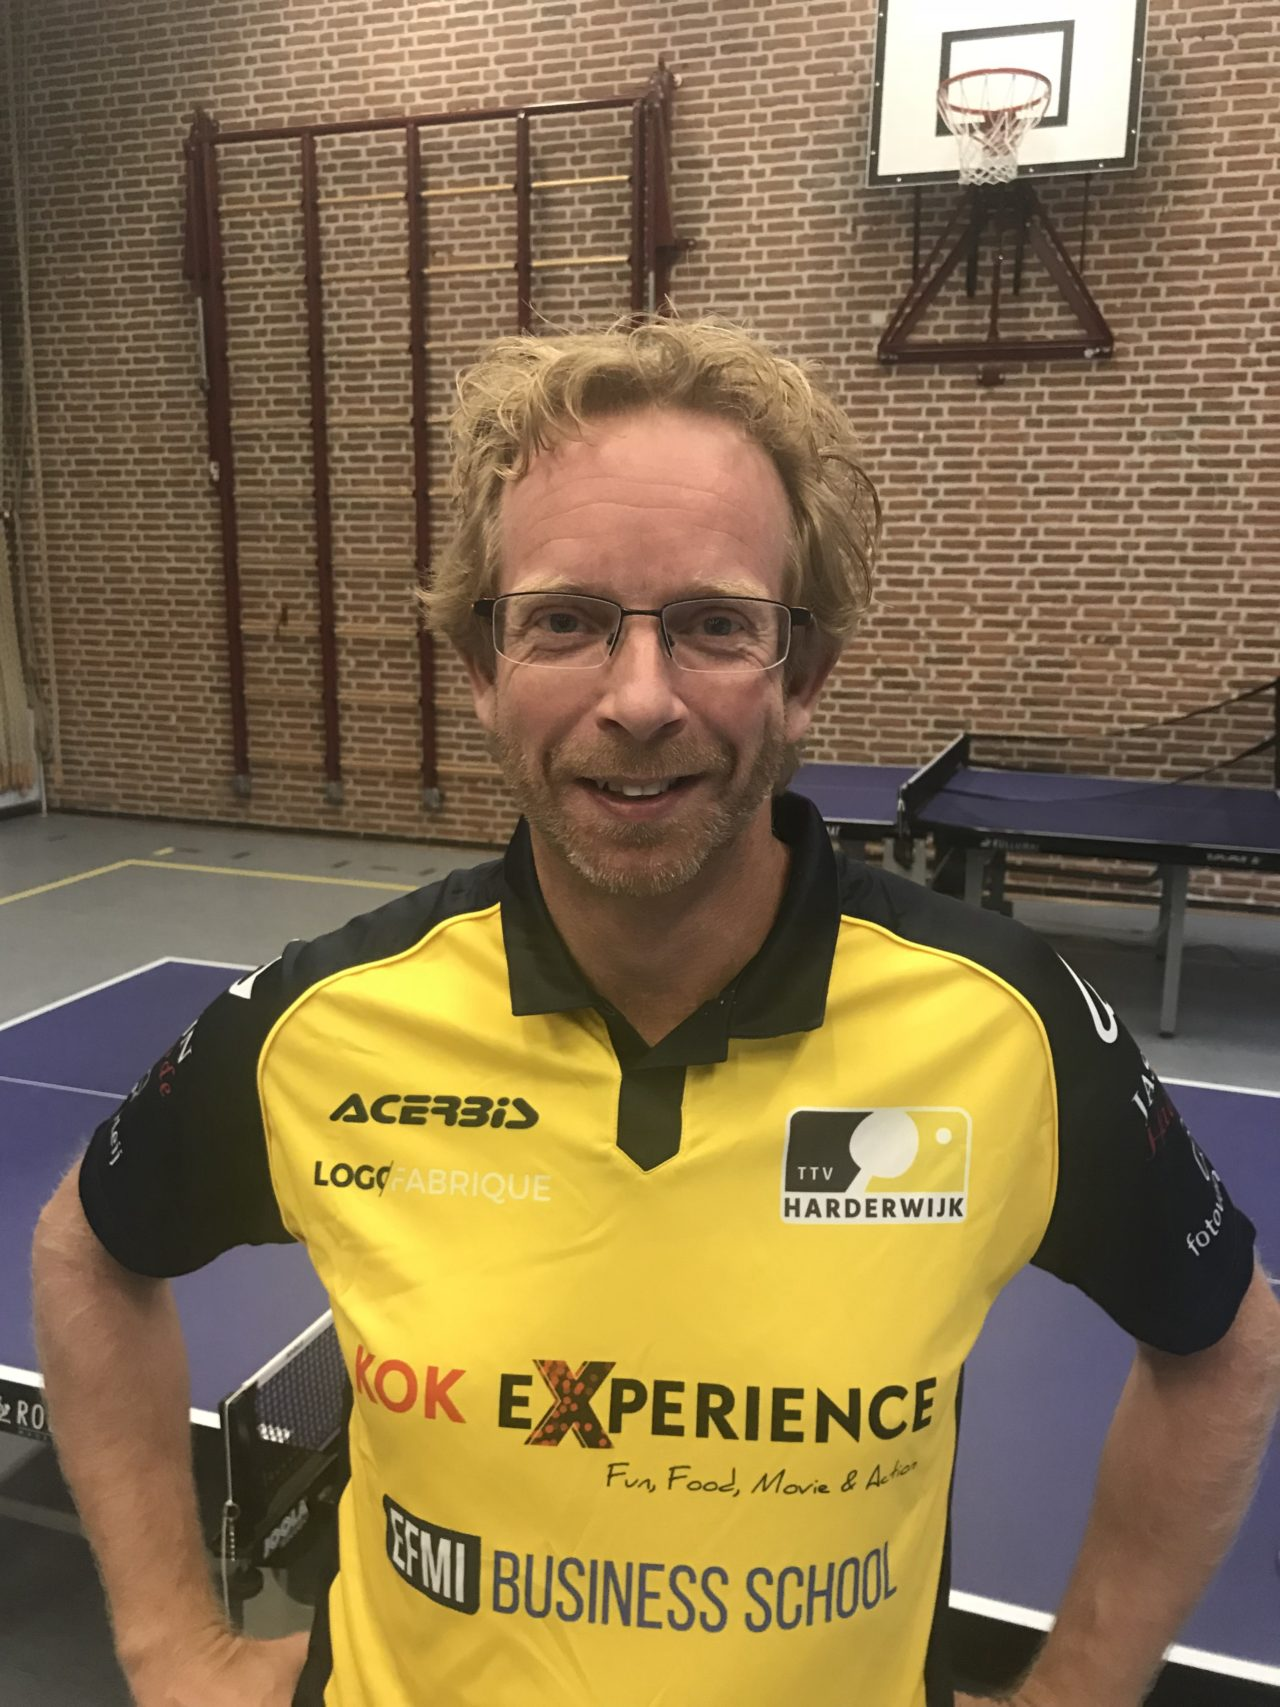 Paul Geurtsen (Paul) Montasser | TTV Harderwijk